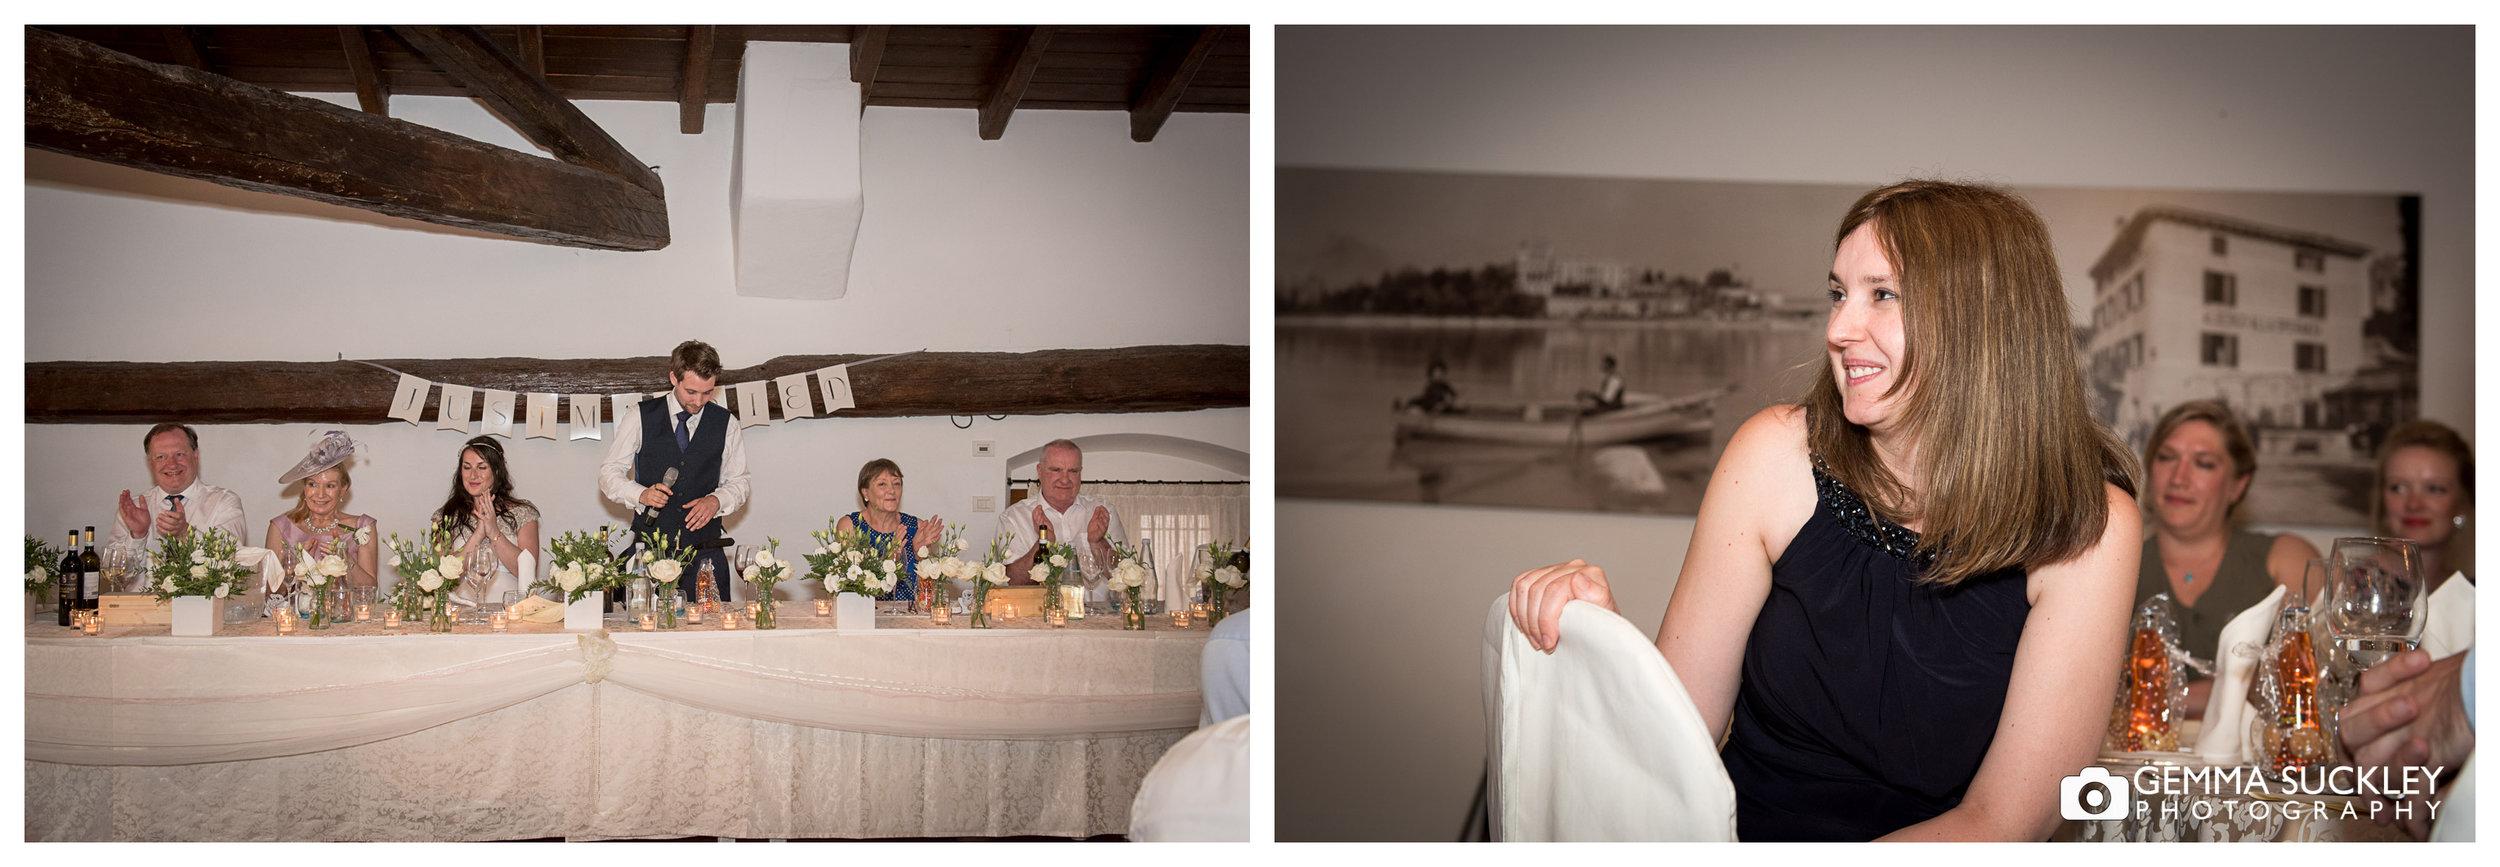 The groom making his speech during his wedding in Lake Garda